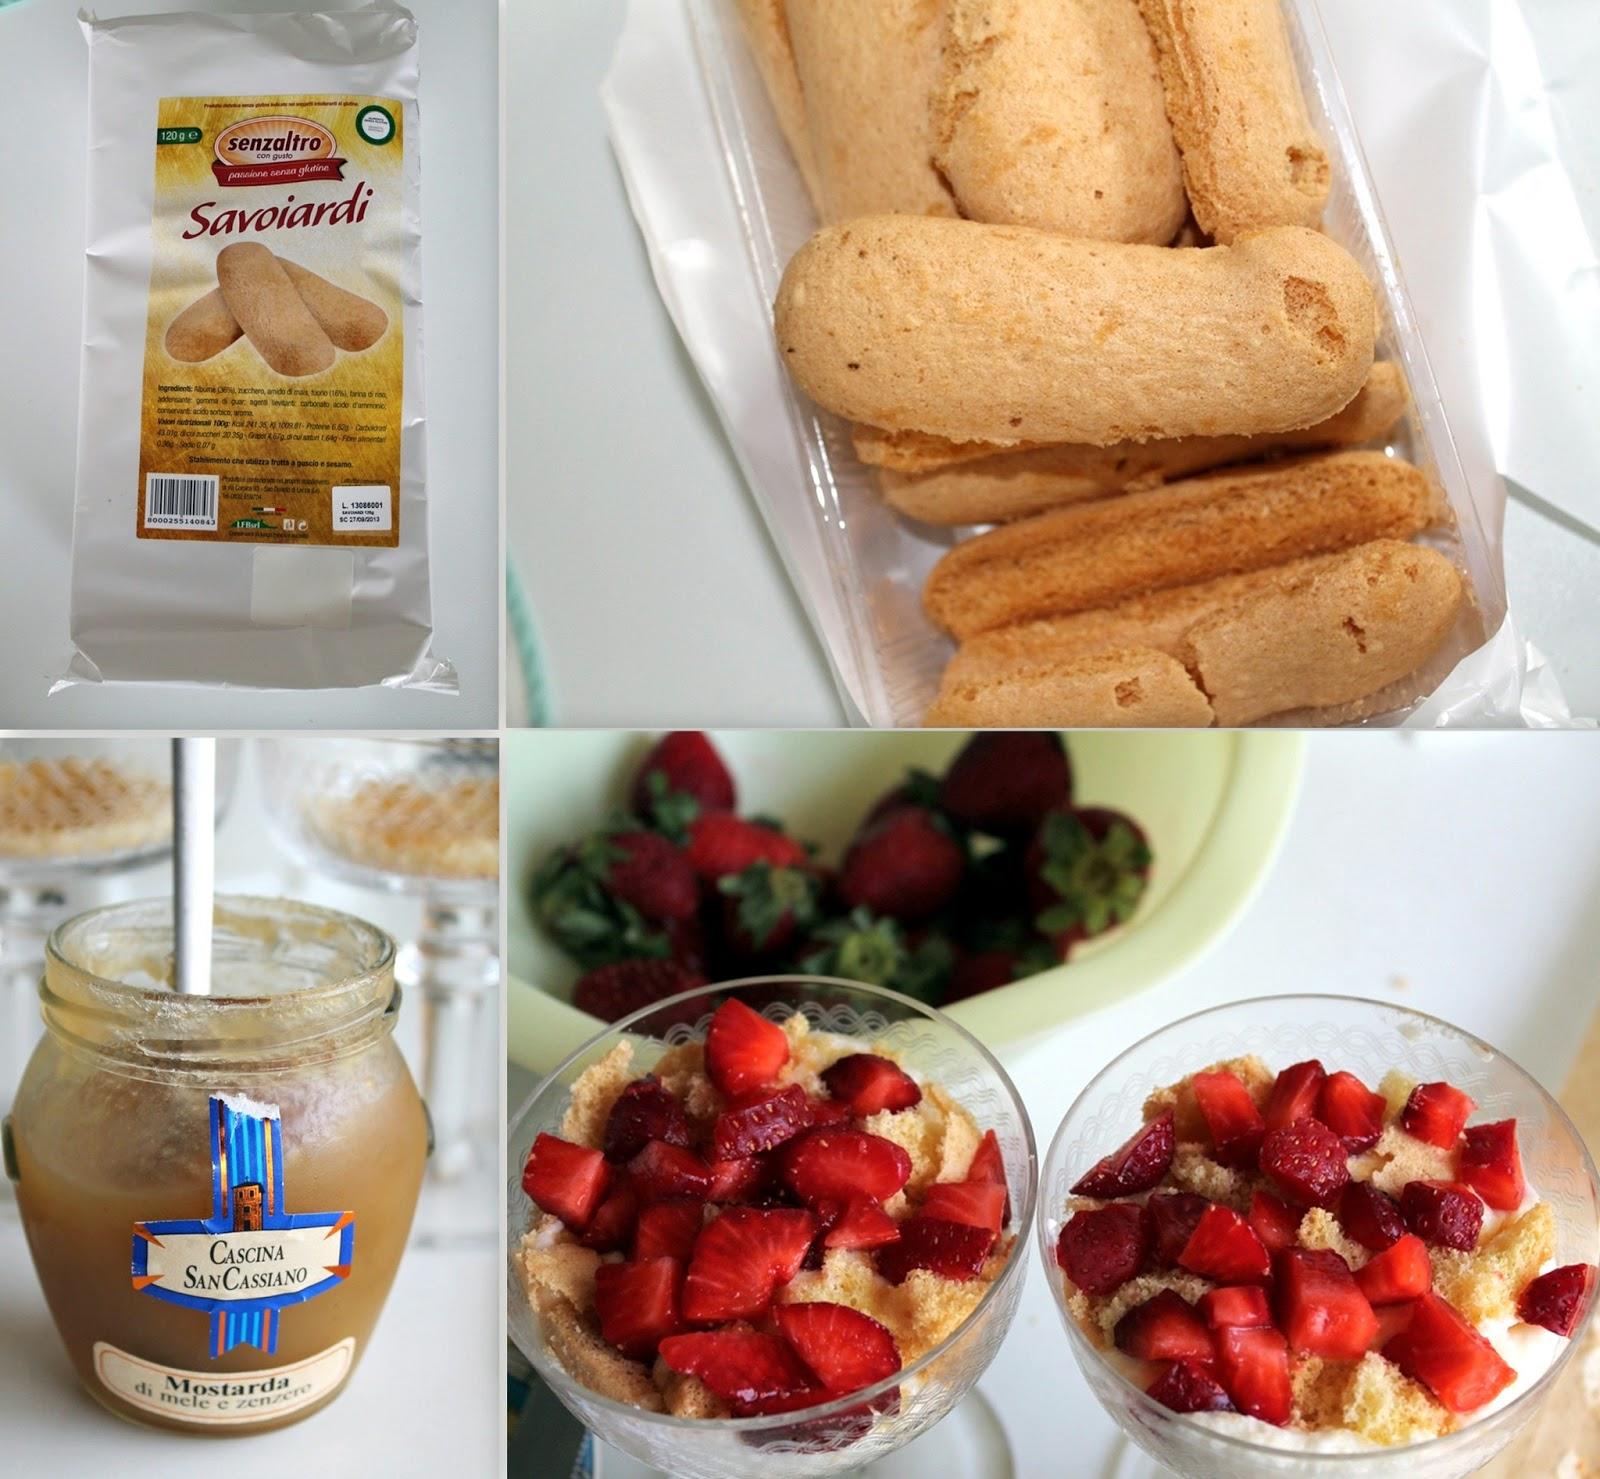 Tiramisù aux fraises sans gluten - La Cassata Celiaca